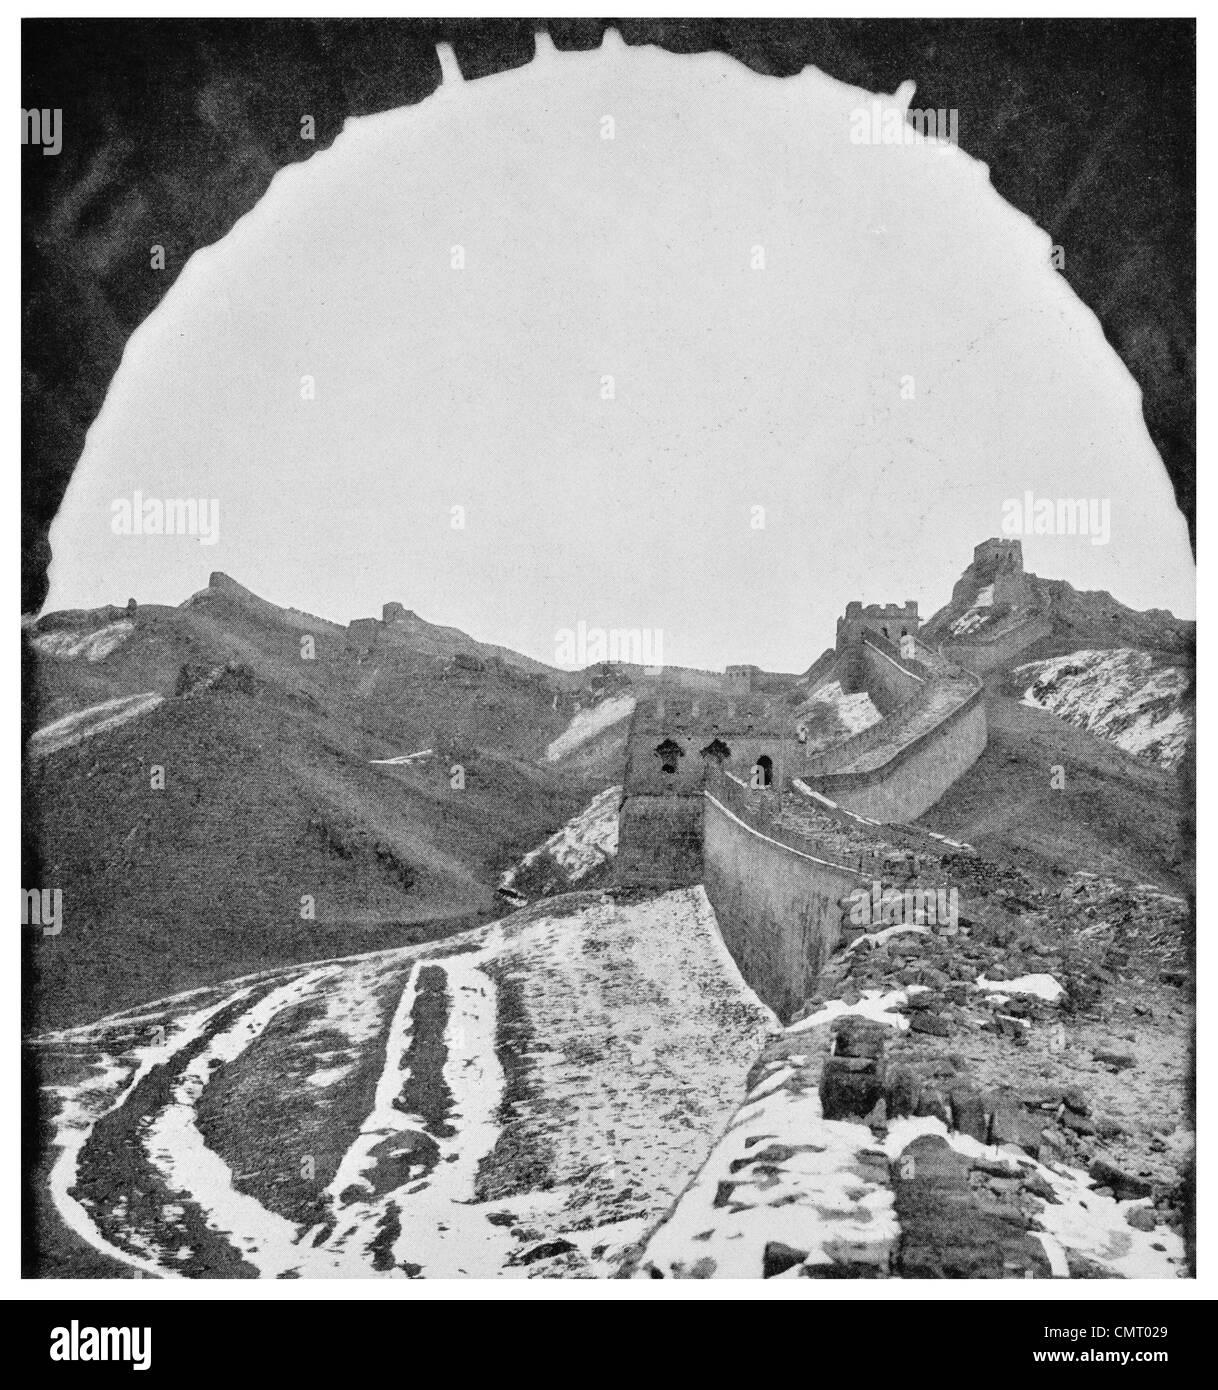 1923 Great Wall of China near Kupehkow - Stock Image